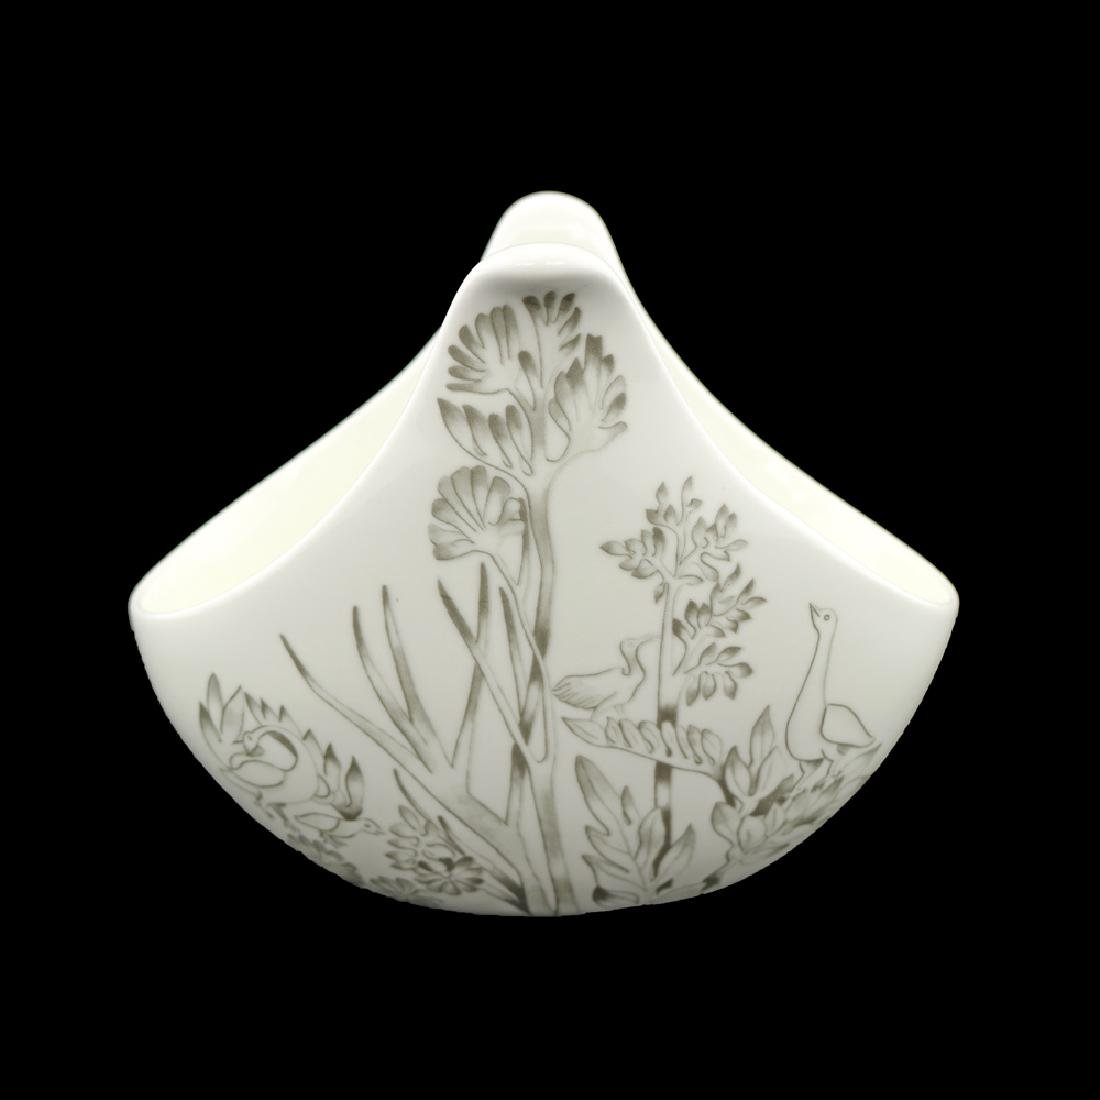 Zeisel Hallcraft Century Nesting Serving Bowls - 10